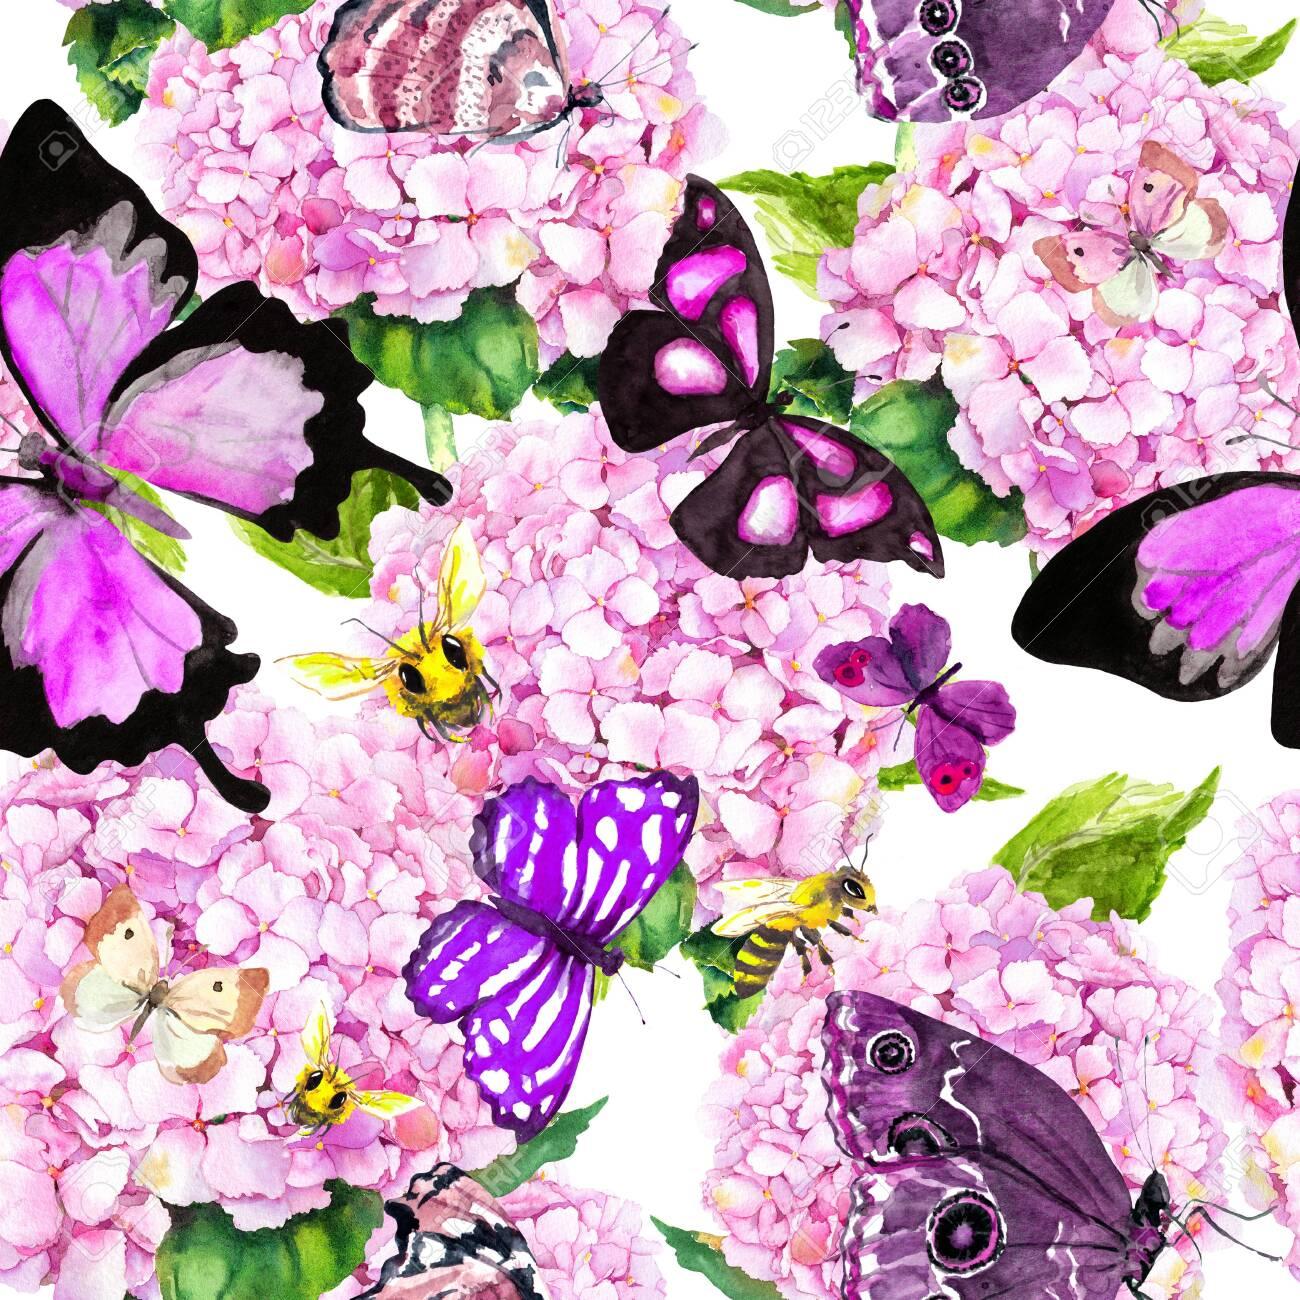 Pink hydrangea flowers, butterflies, bees. Seamless floral pattern. Watercolor. - 130911599